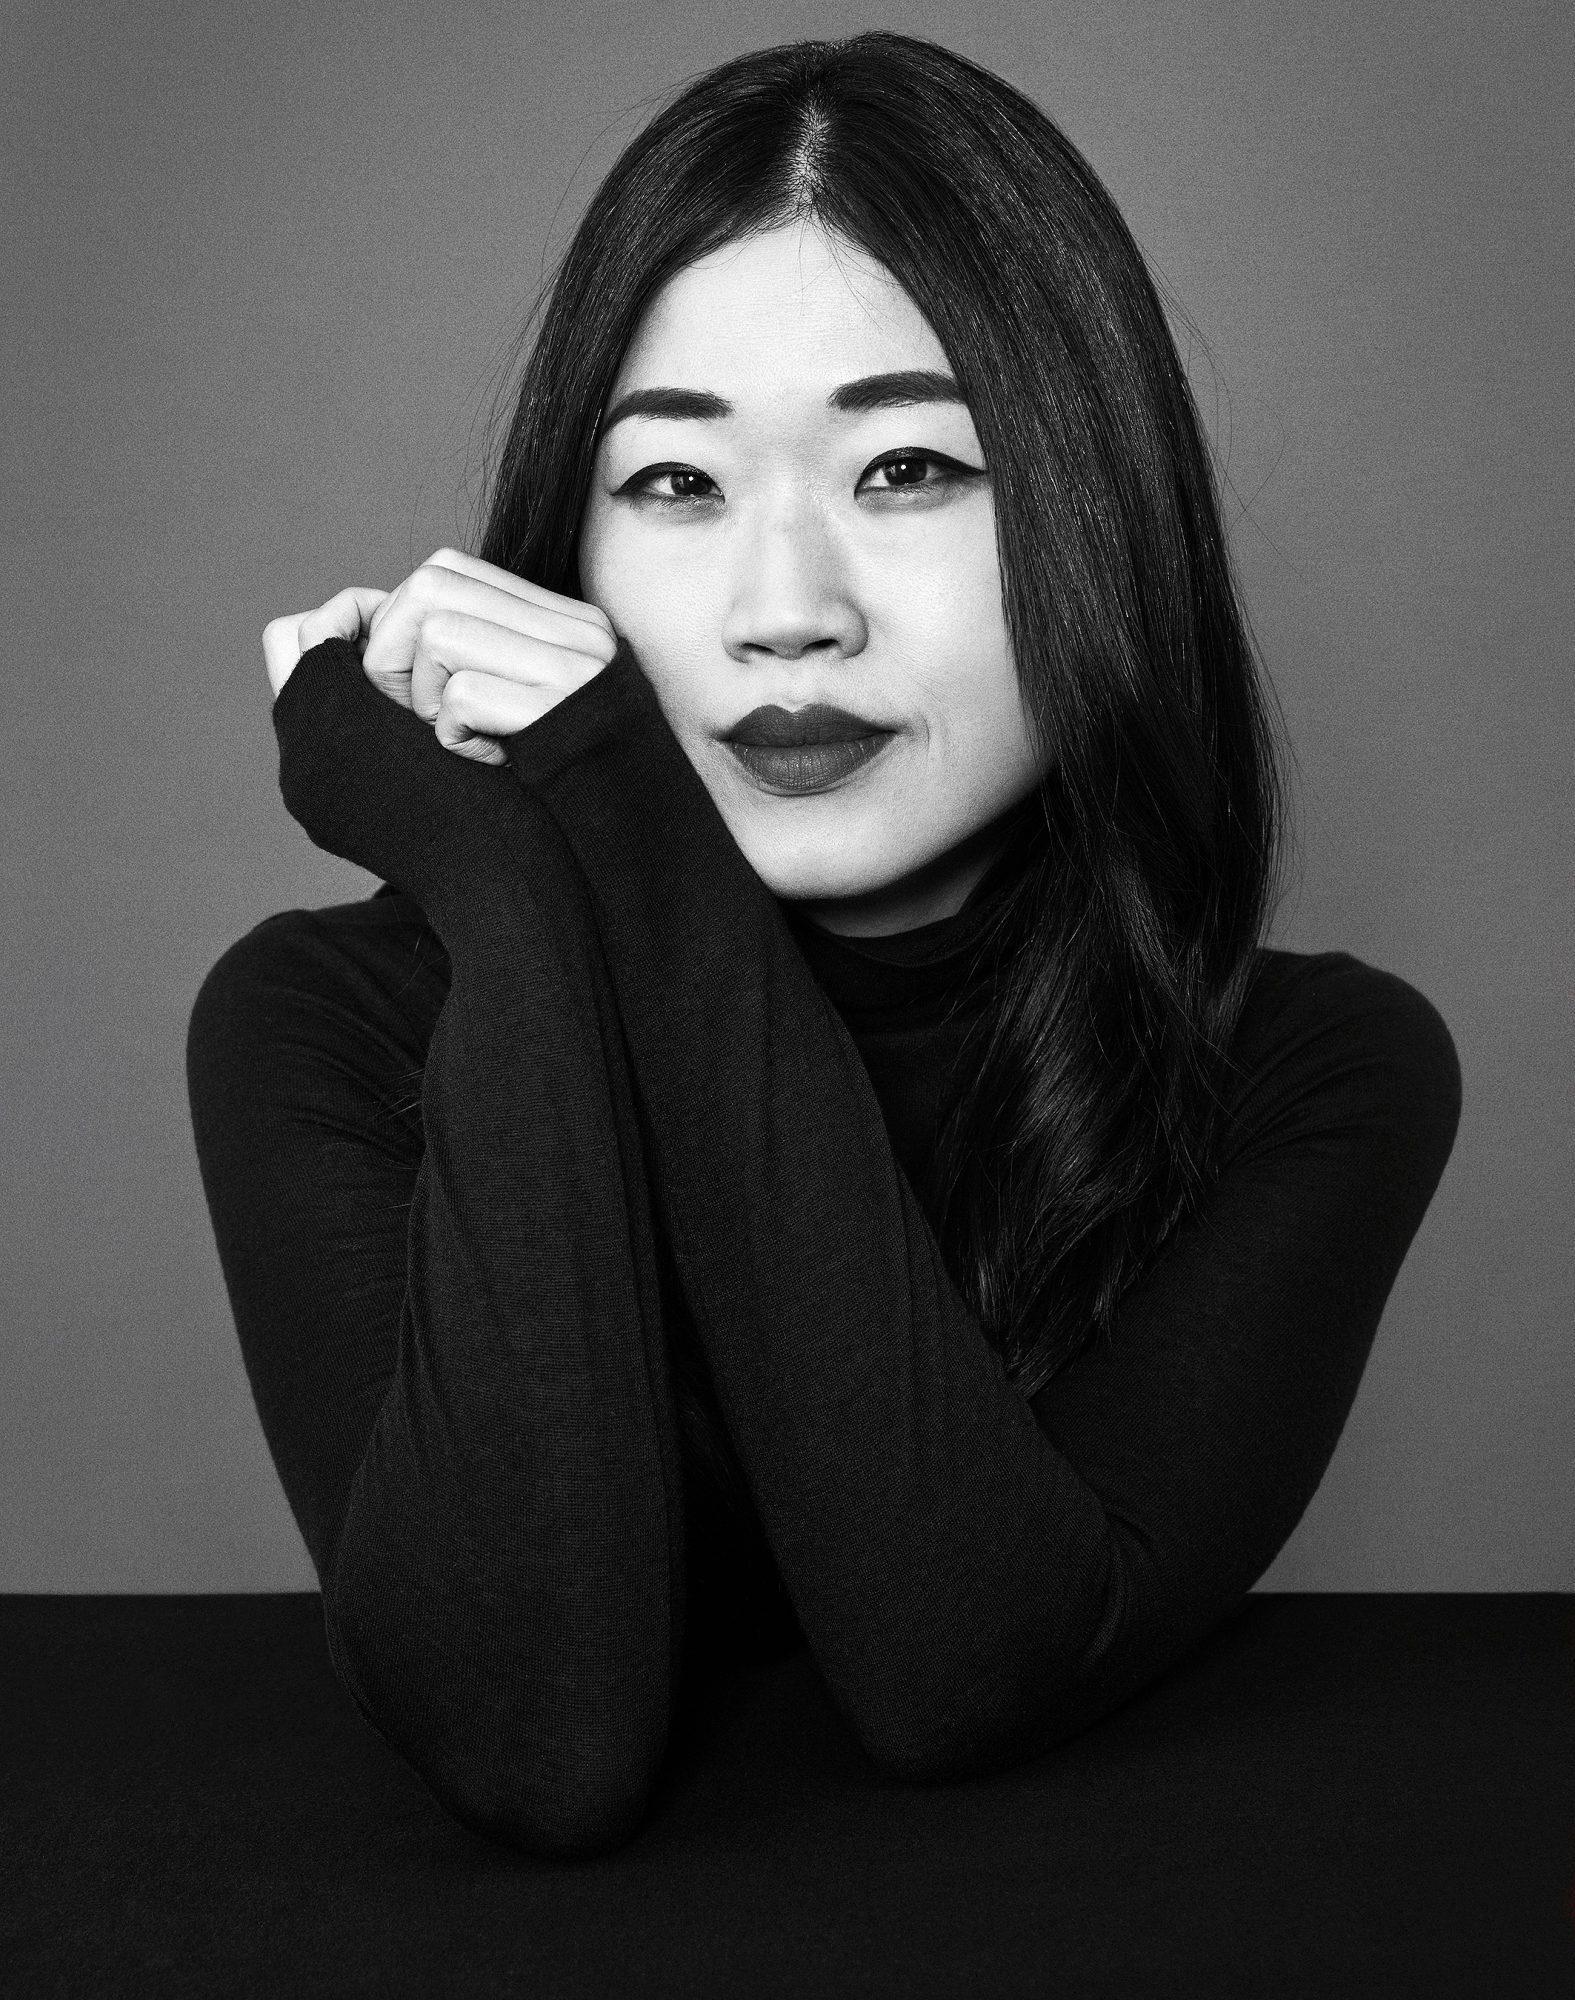 Mary-HK-Choi-1